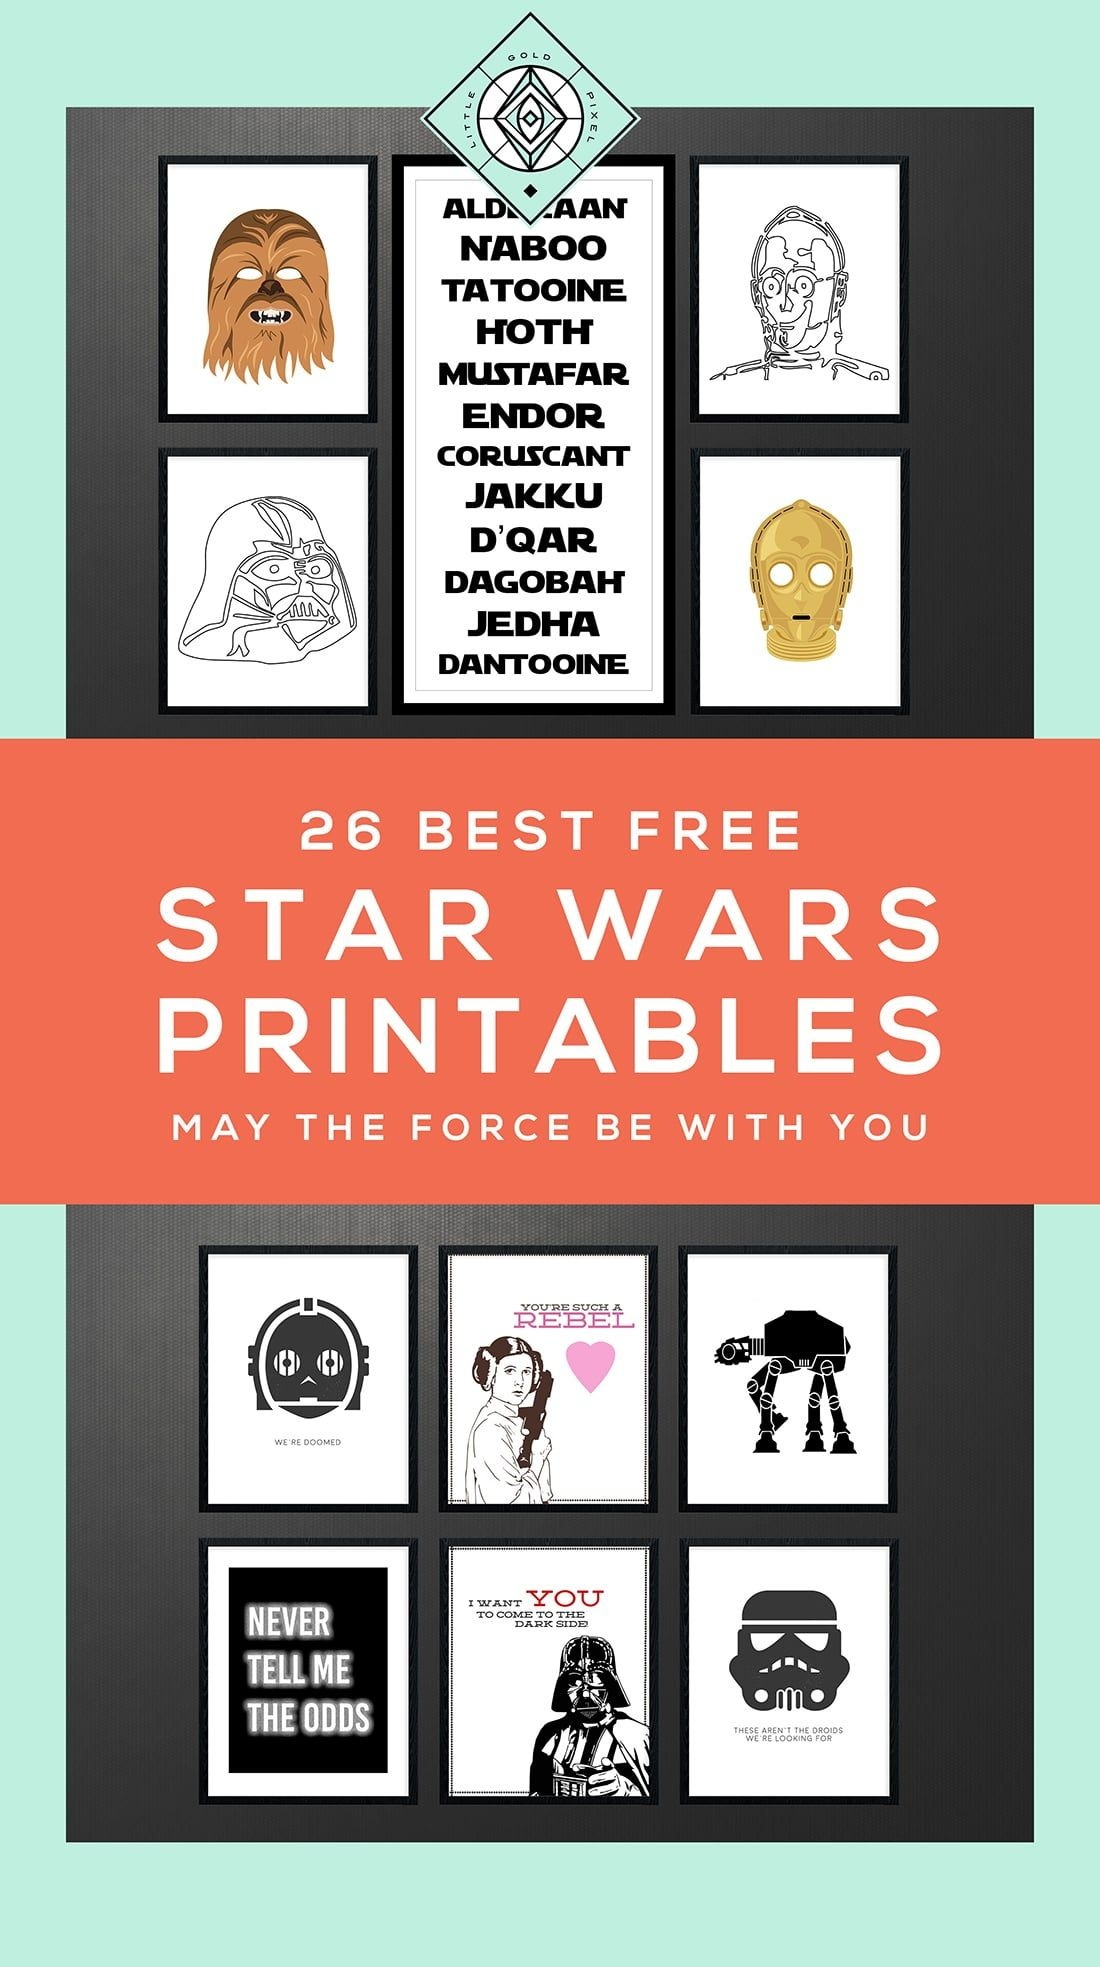 Star Wars Free Printables • A Roundup | Free Printables • Roundups - Free Star Wars Printables